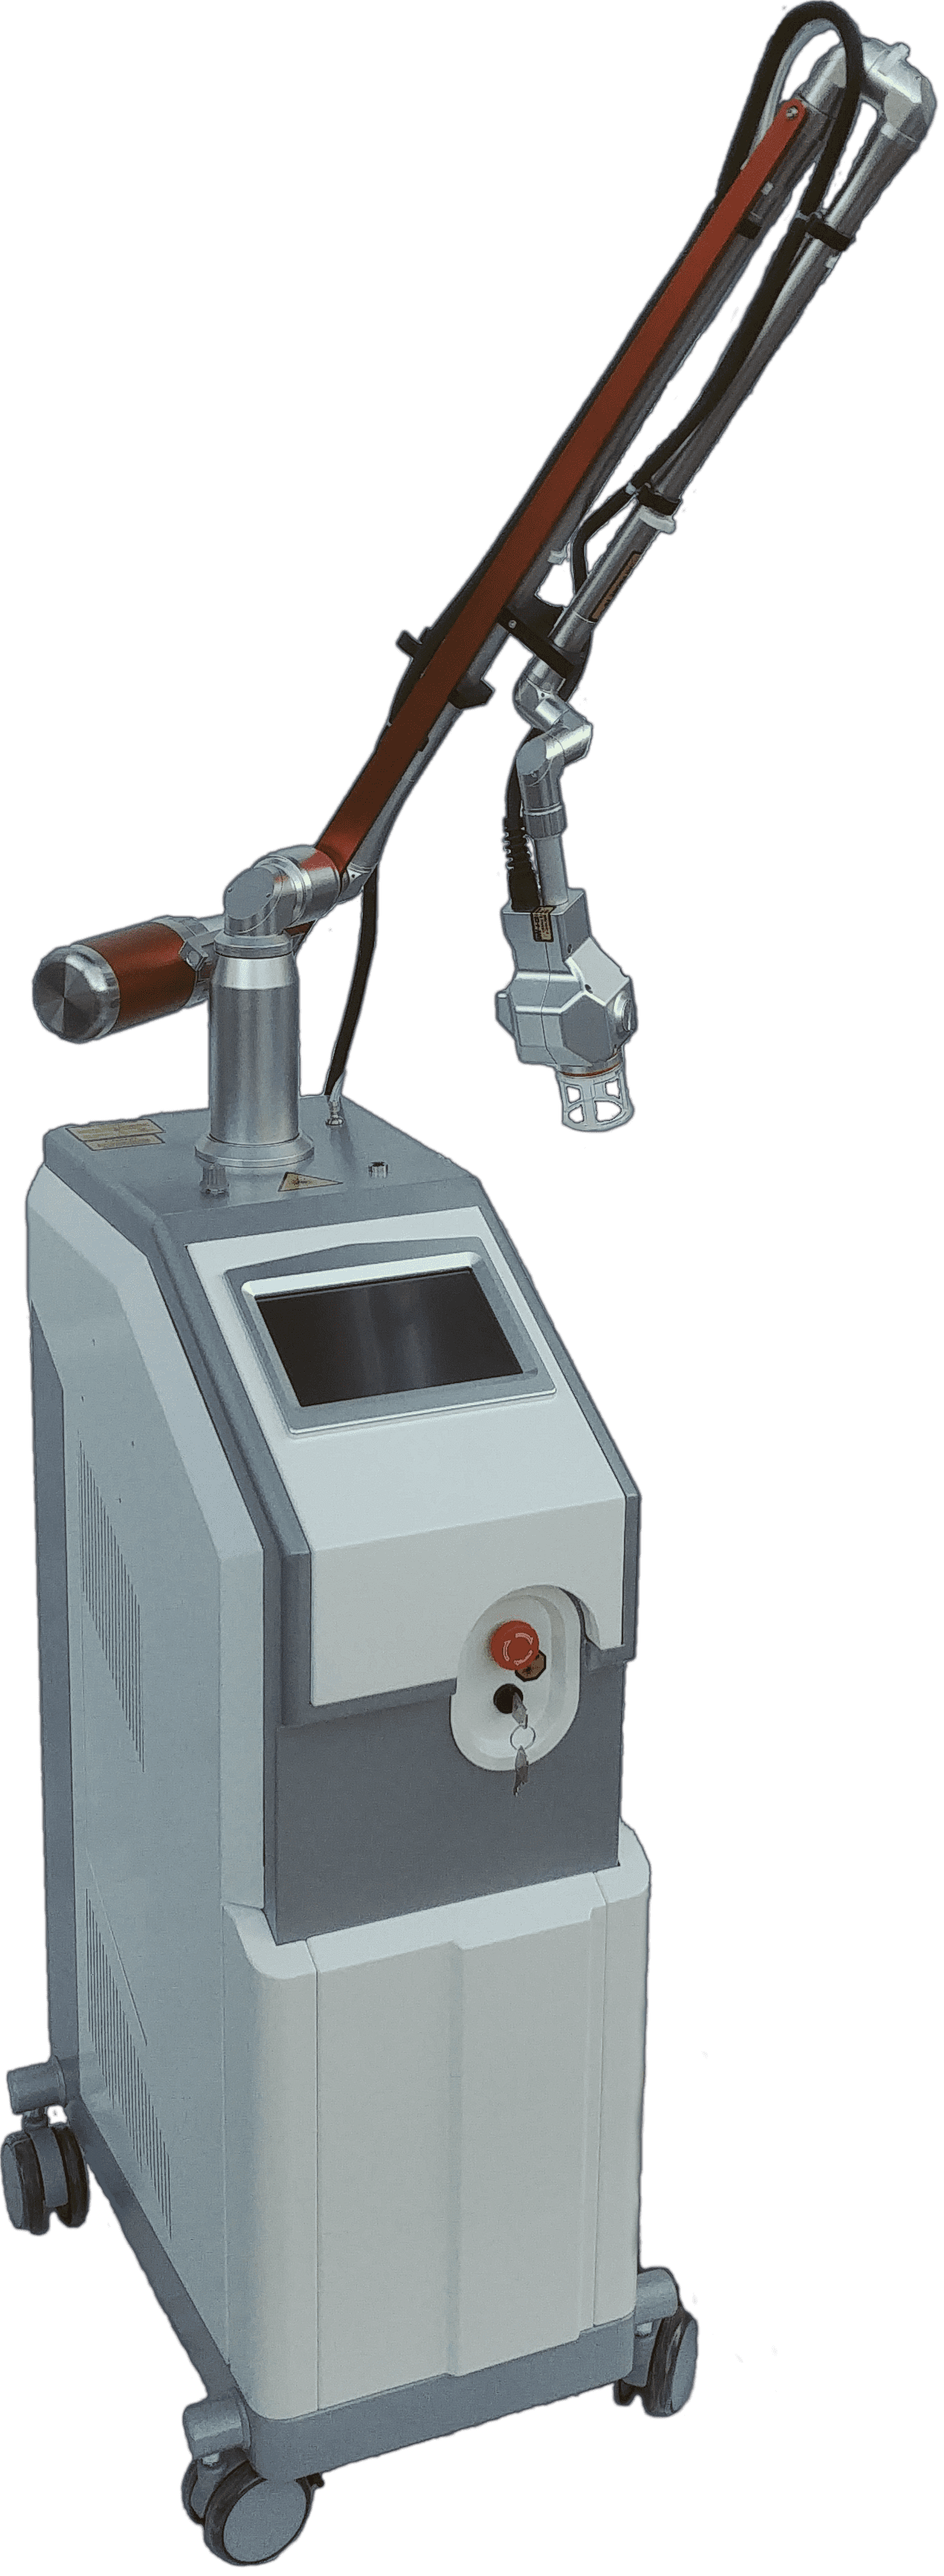 CO2 лазер Космопульс купить